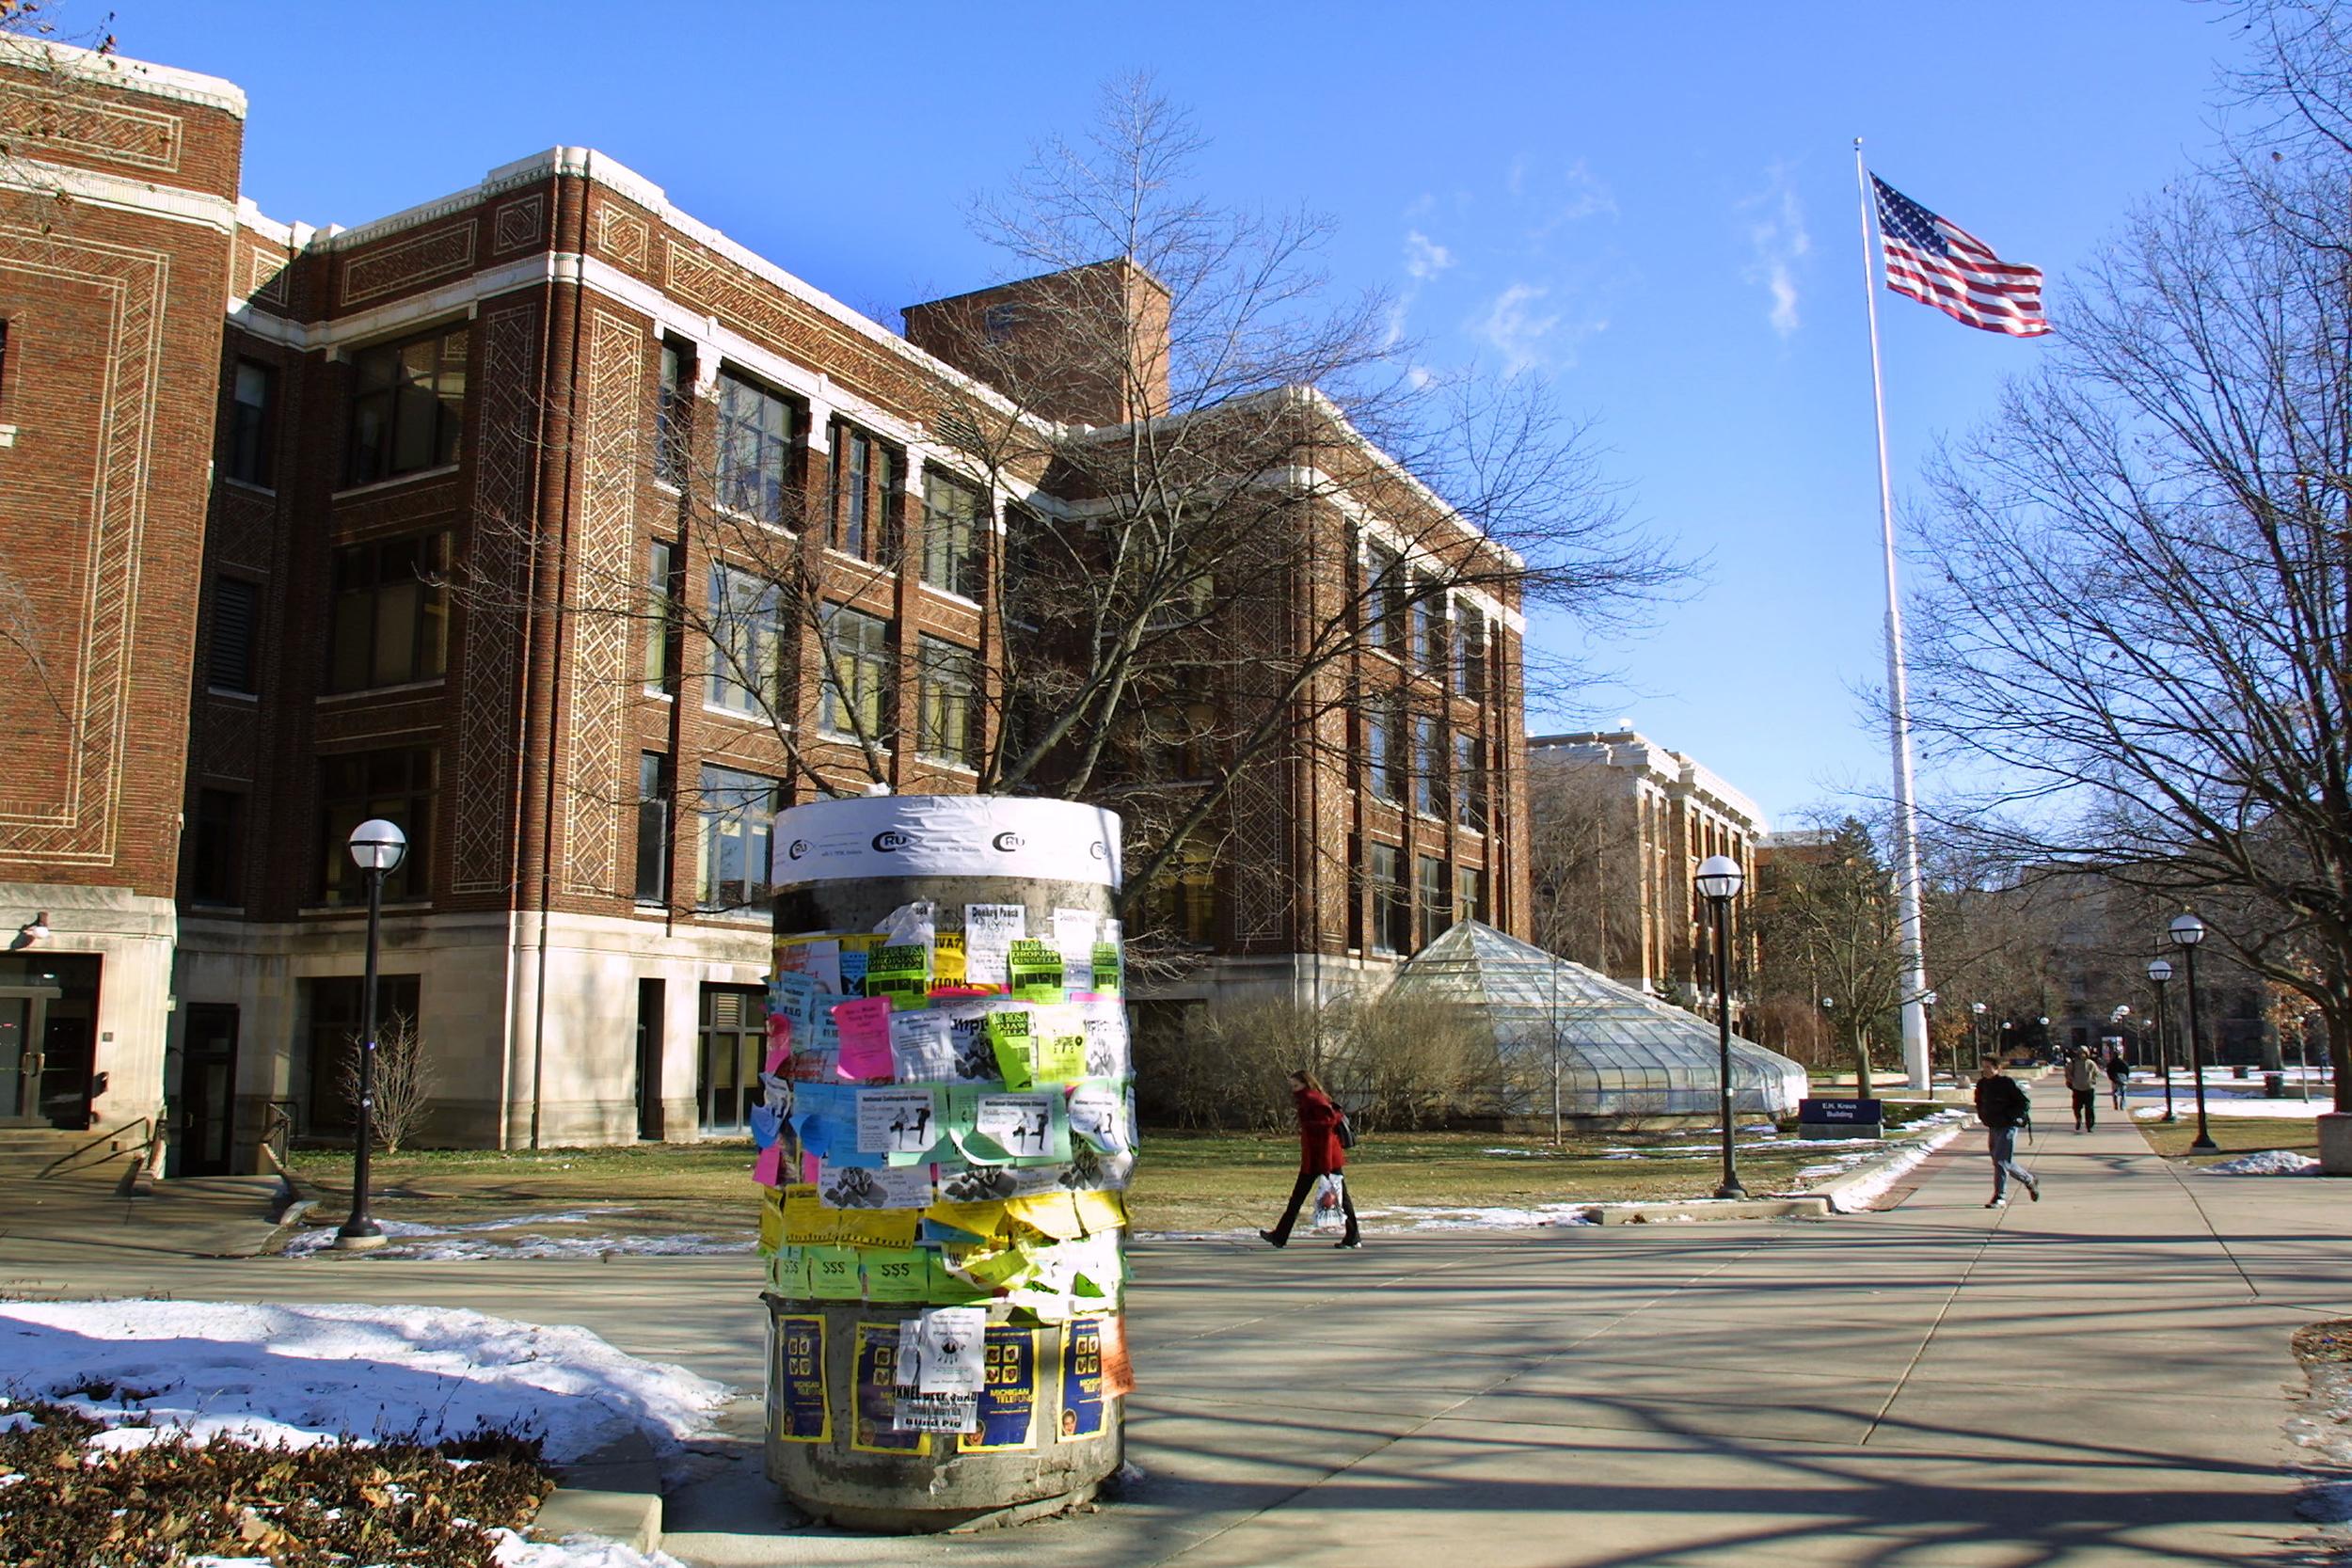 Justice-Department-intervenes-in-freedom-speech-case-at-university